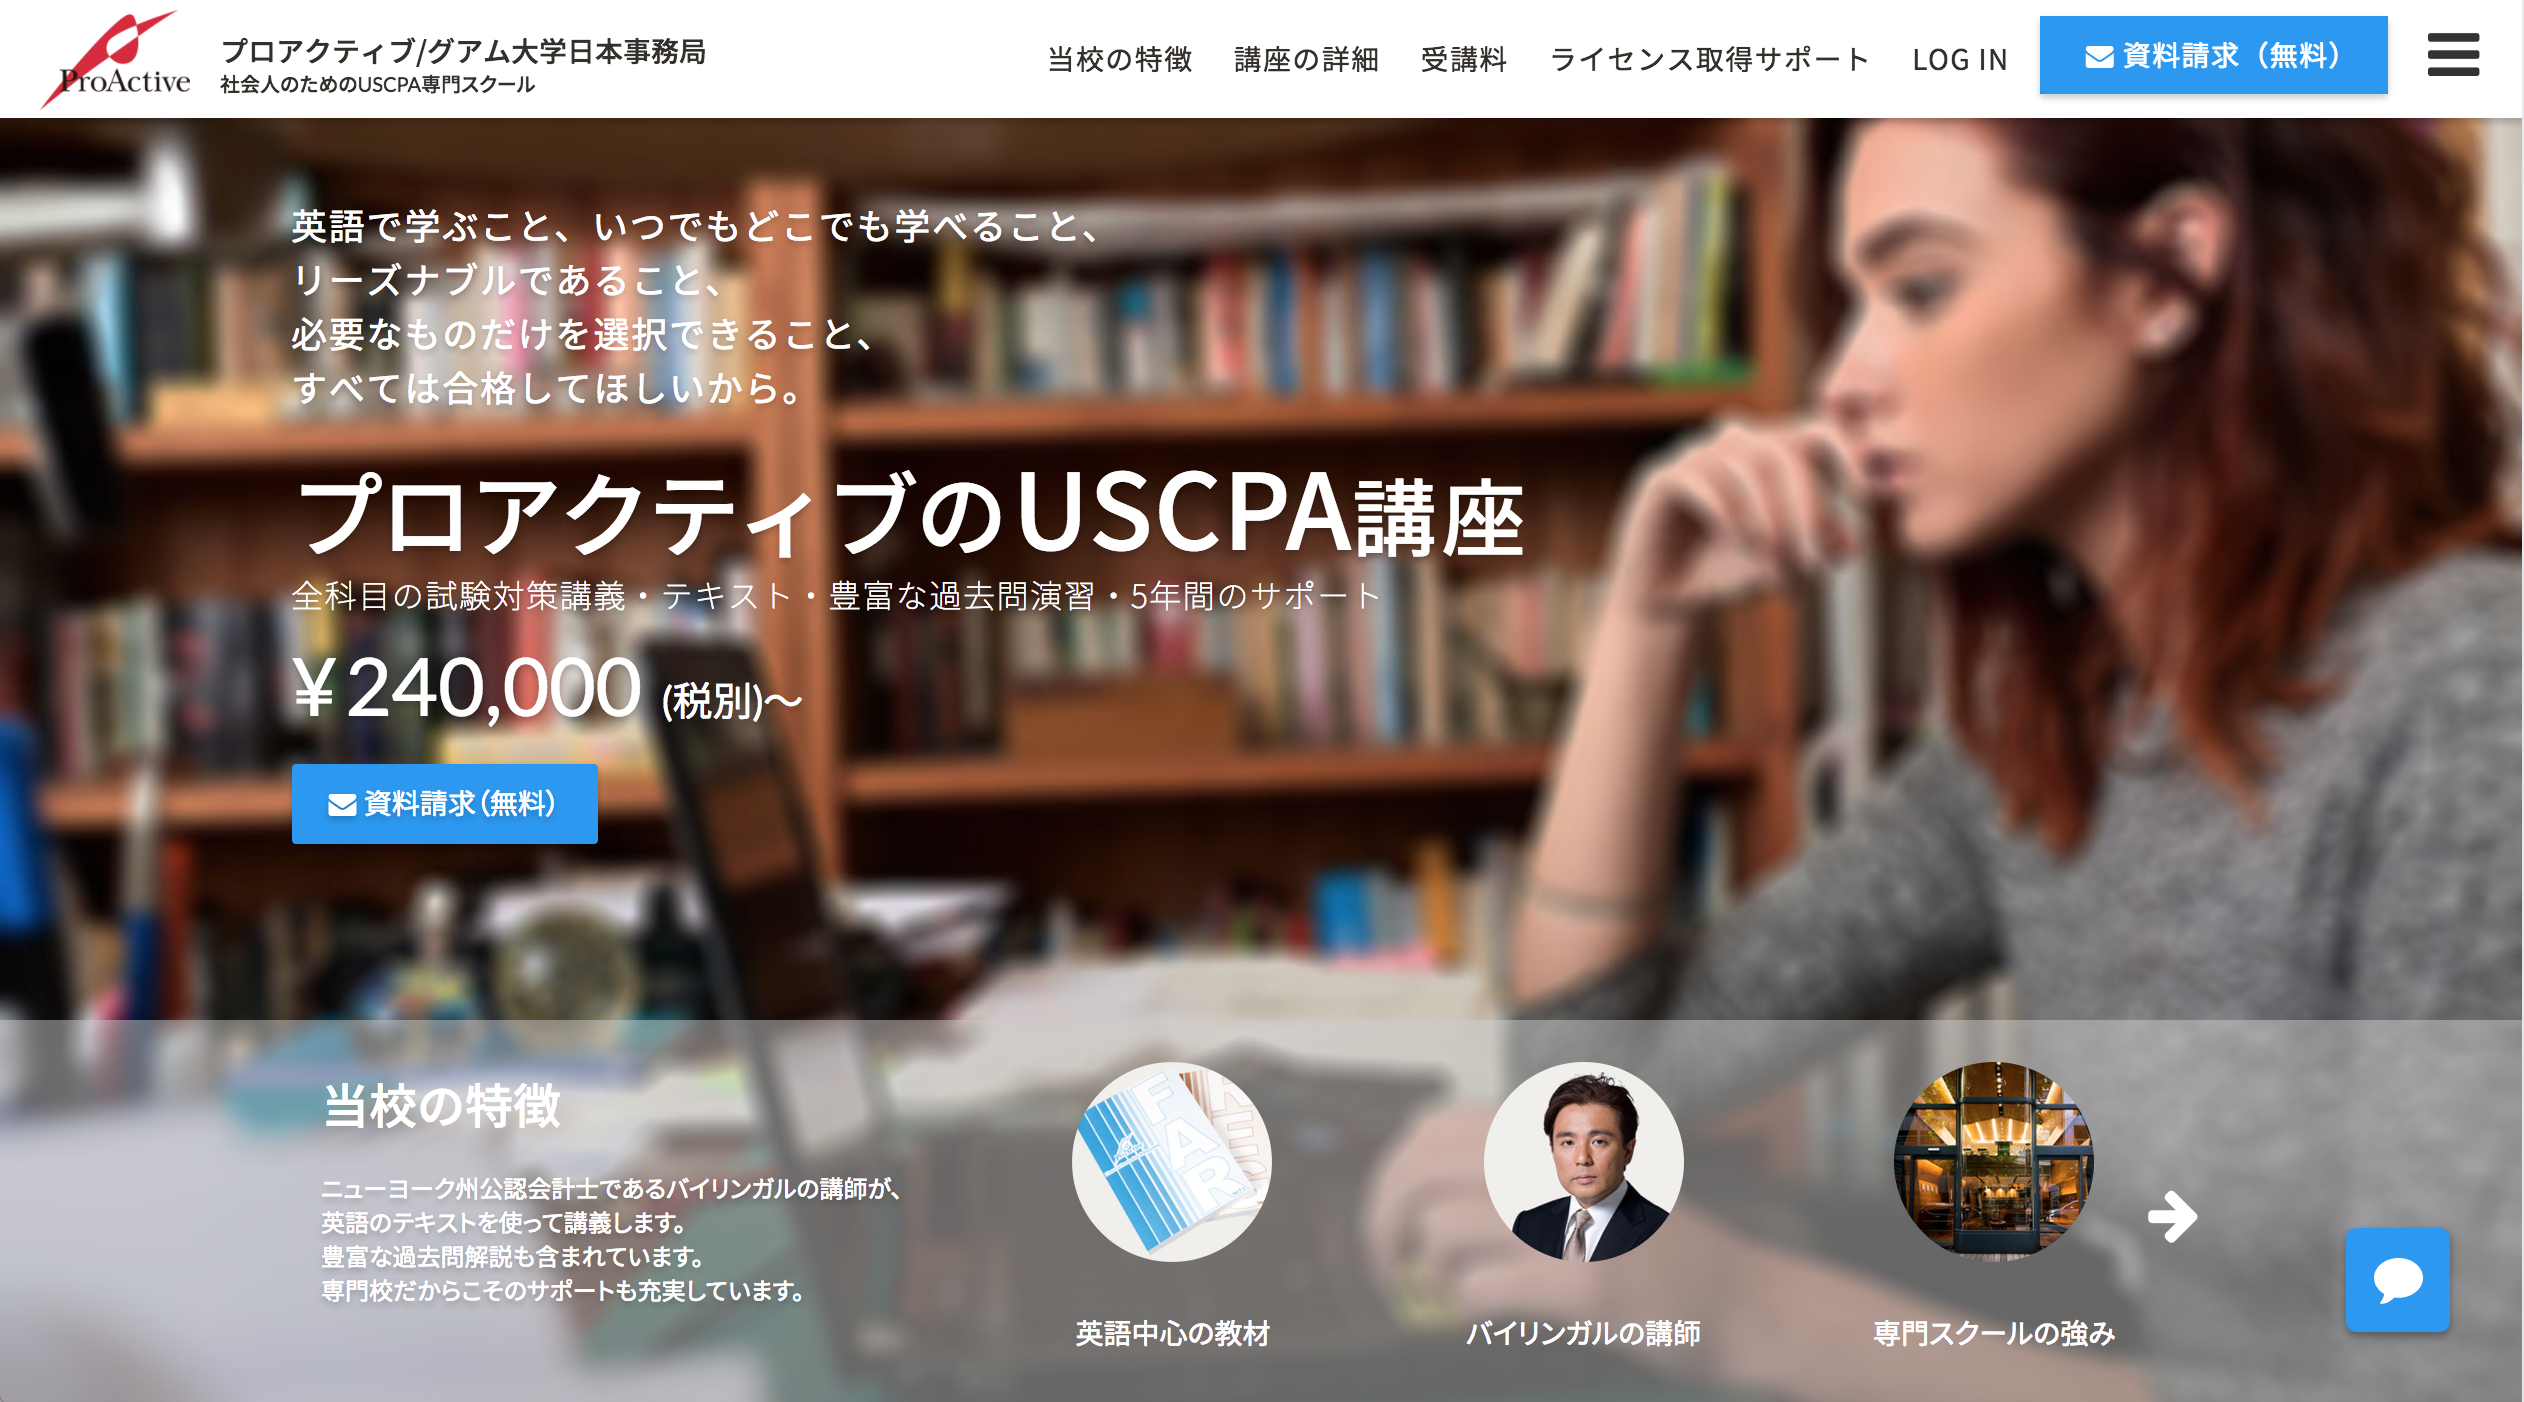 【2018】USCPA(米国公認会計士)おすすめ予備校2校 徹底比較